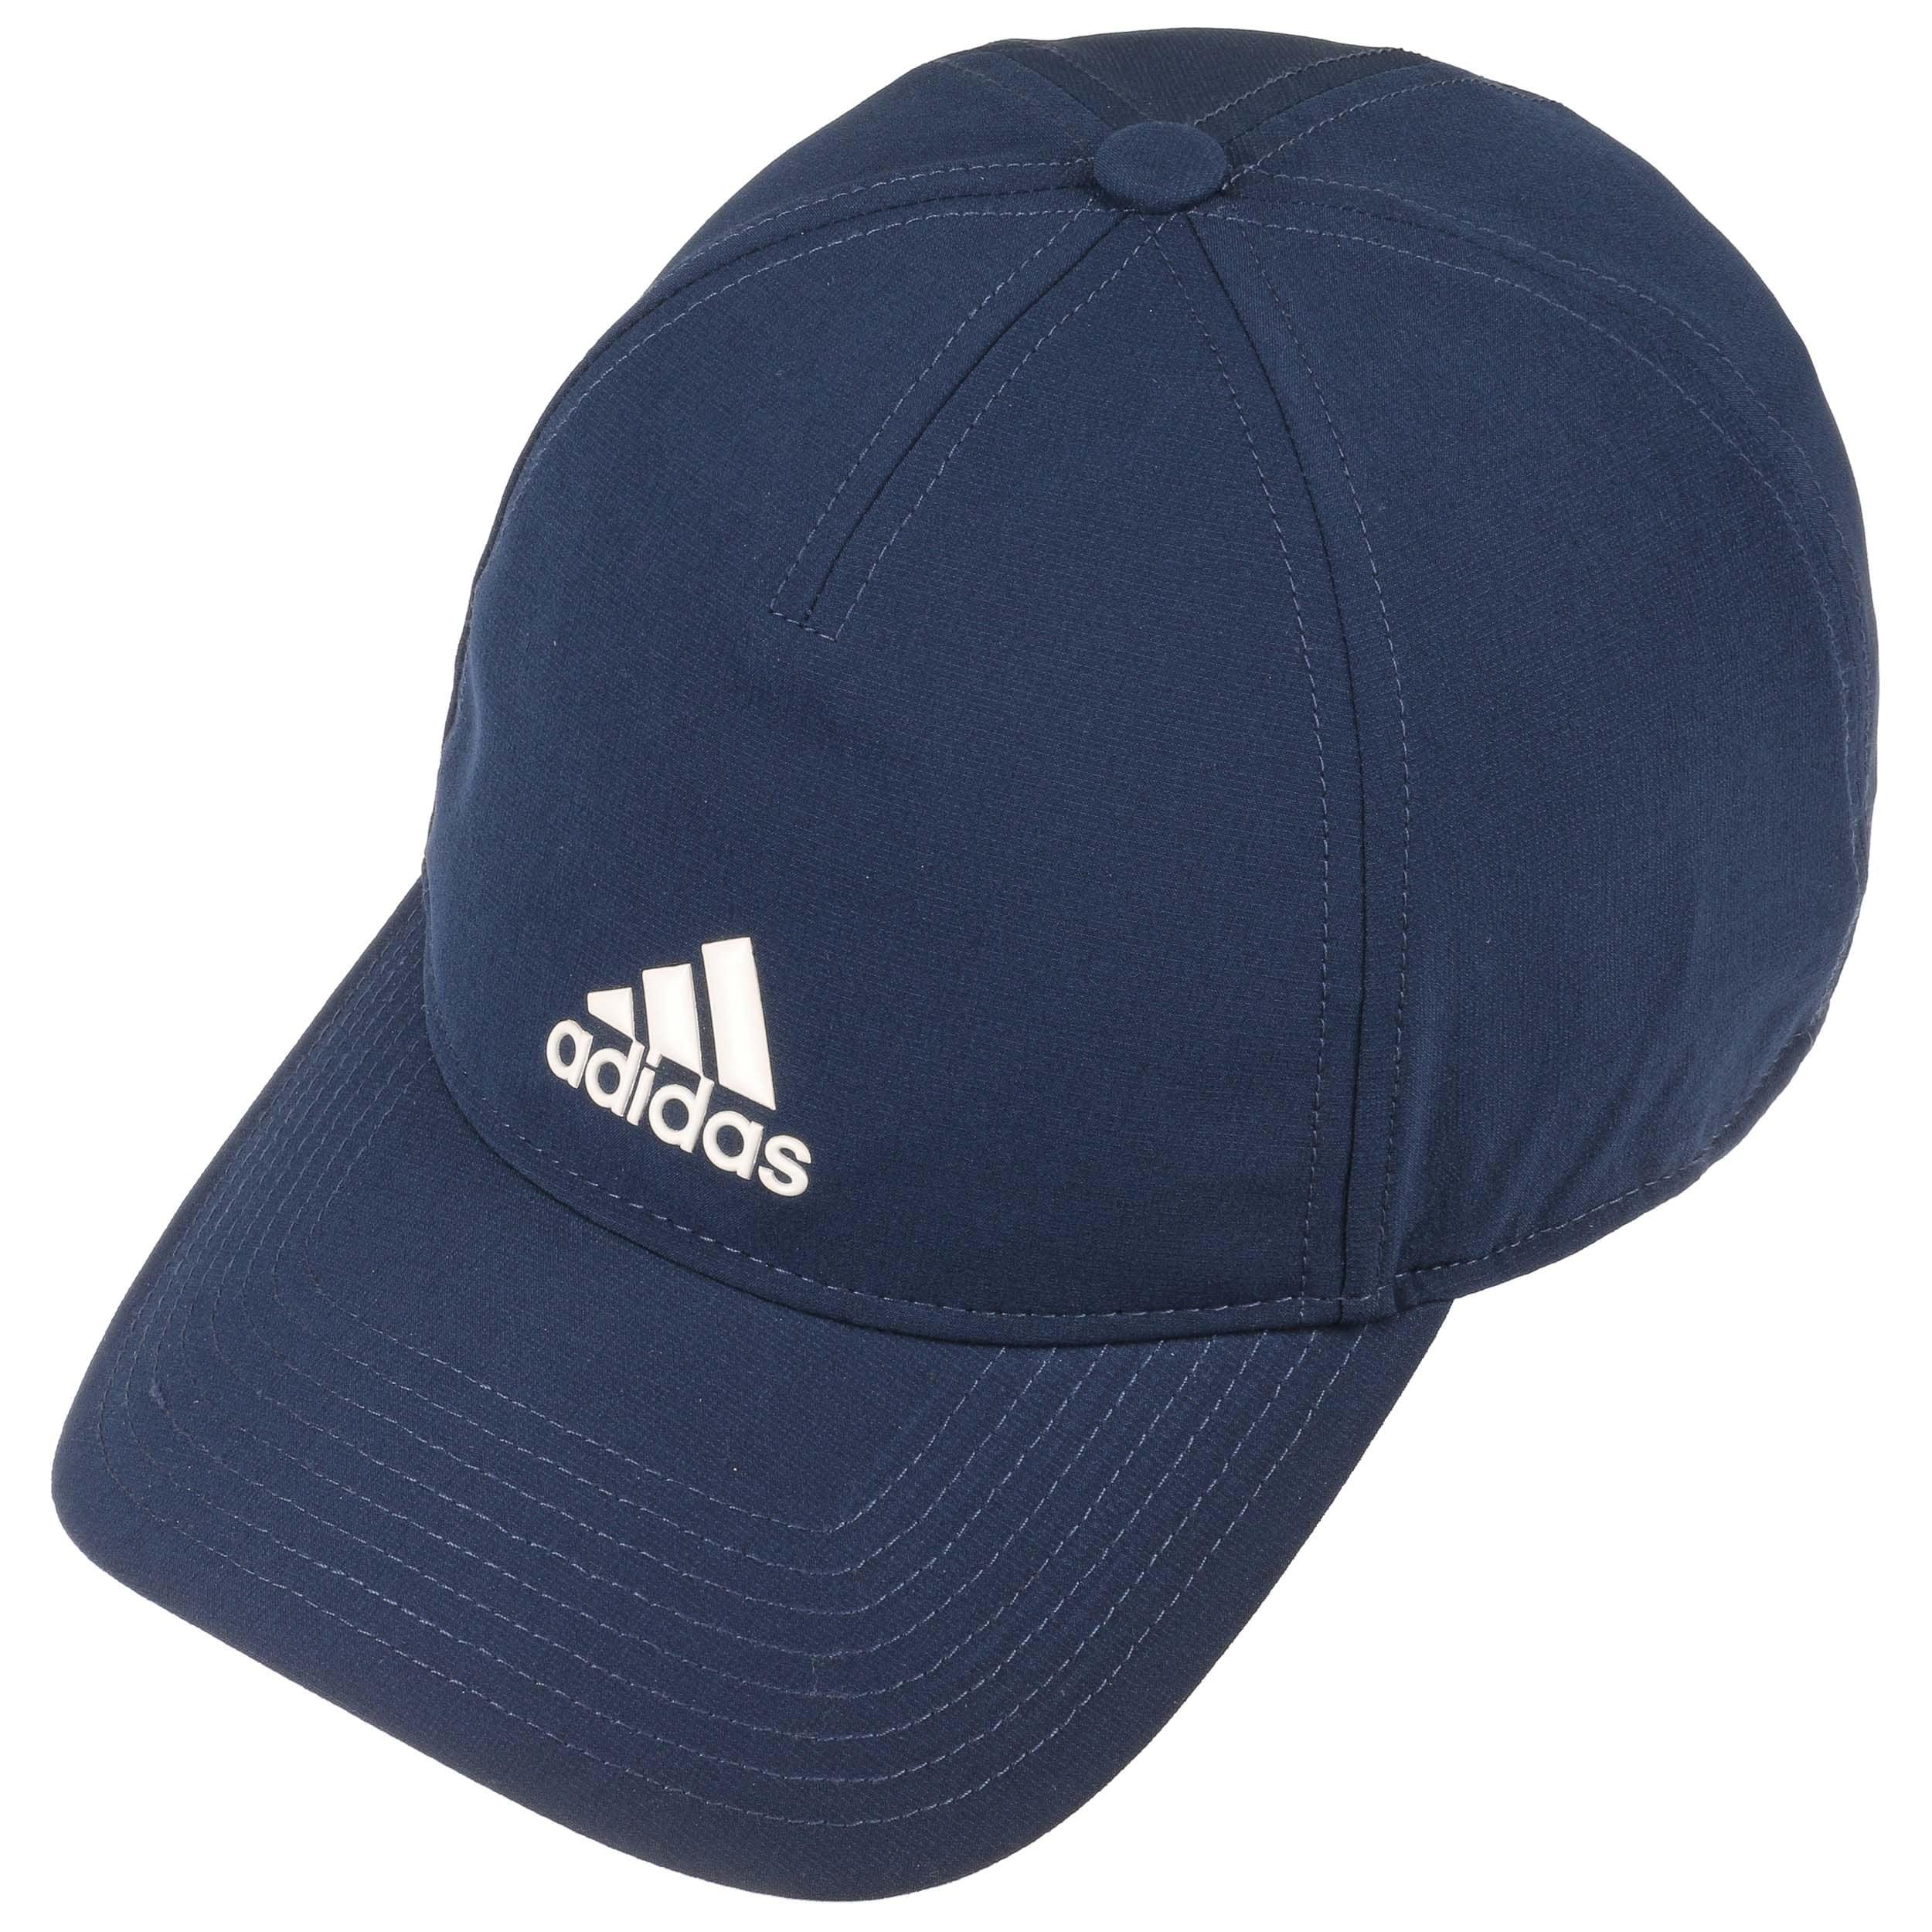 Gorra C40 5P Climalite by adidas - Gorras - sombreroshop.es 8a73d7f727d